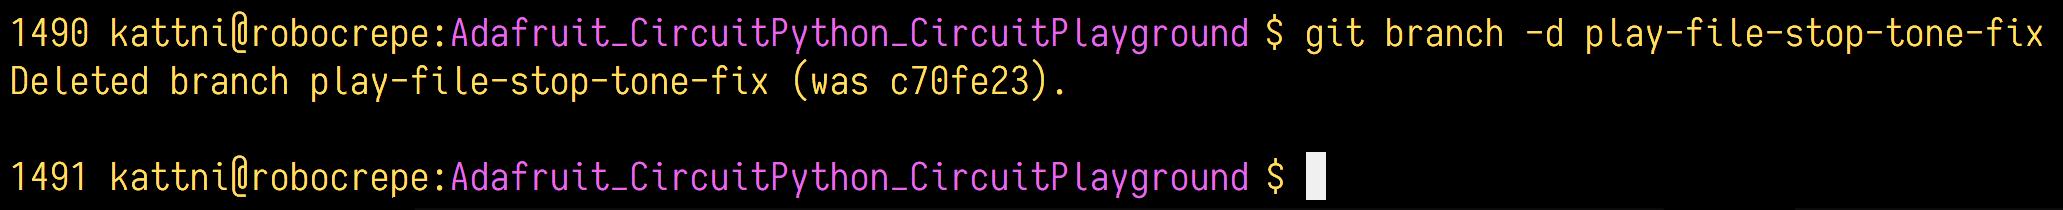 circuitpython_GitDeleteBranch.png